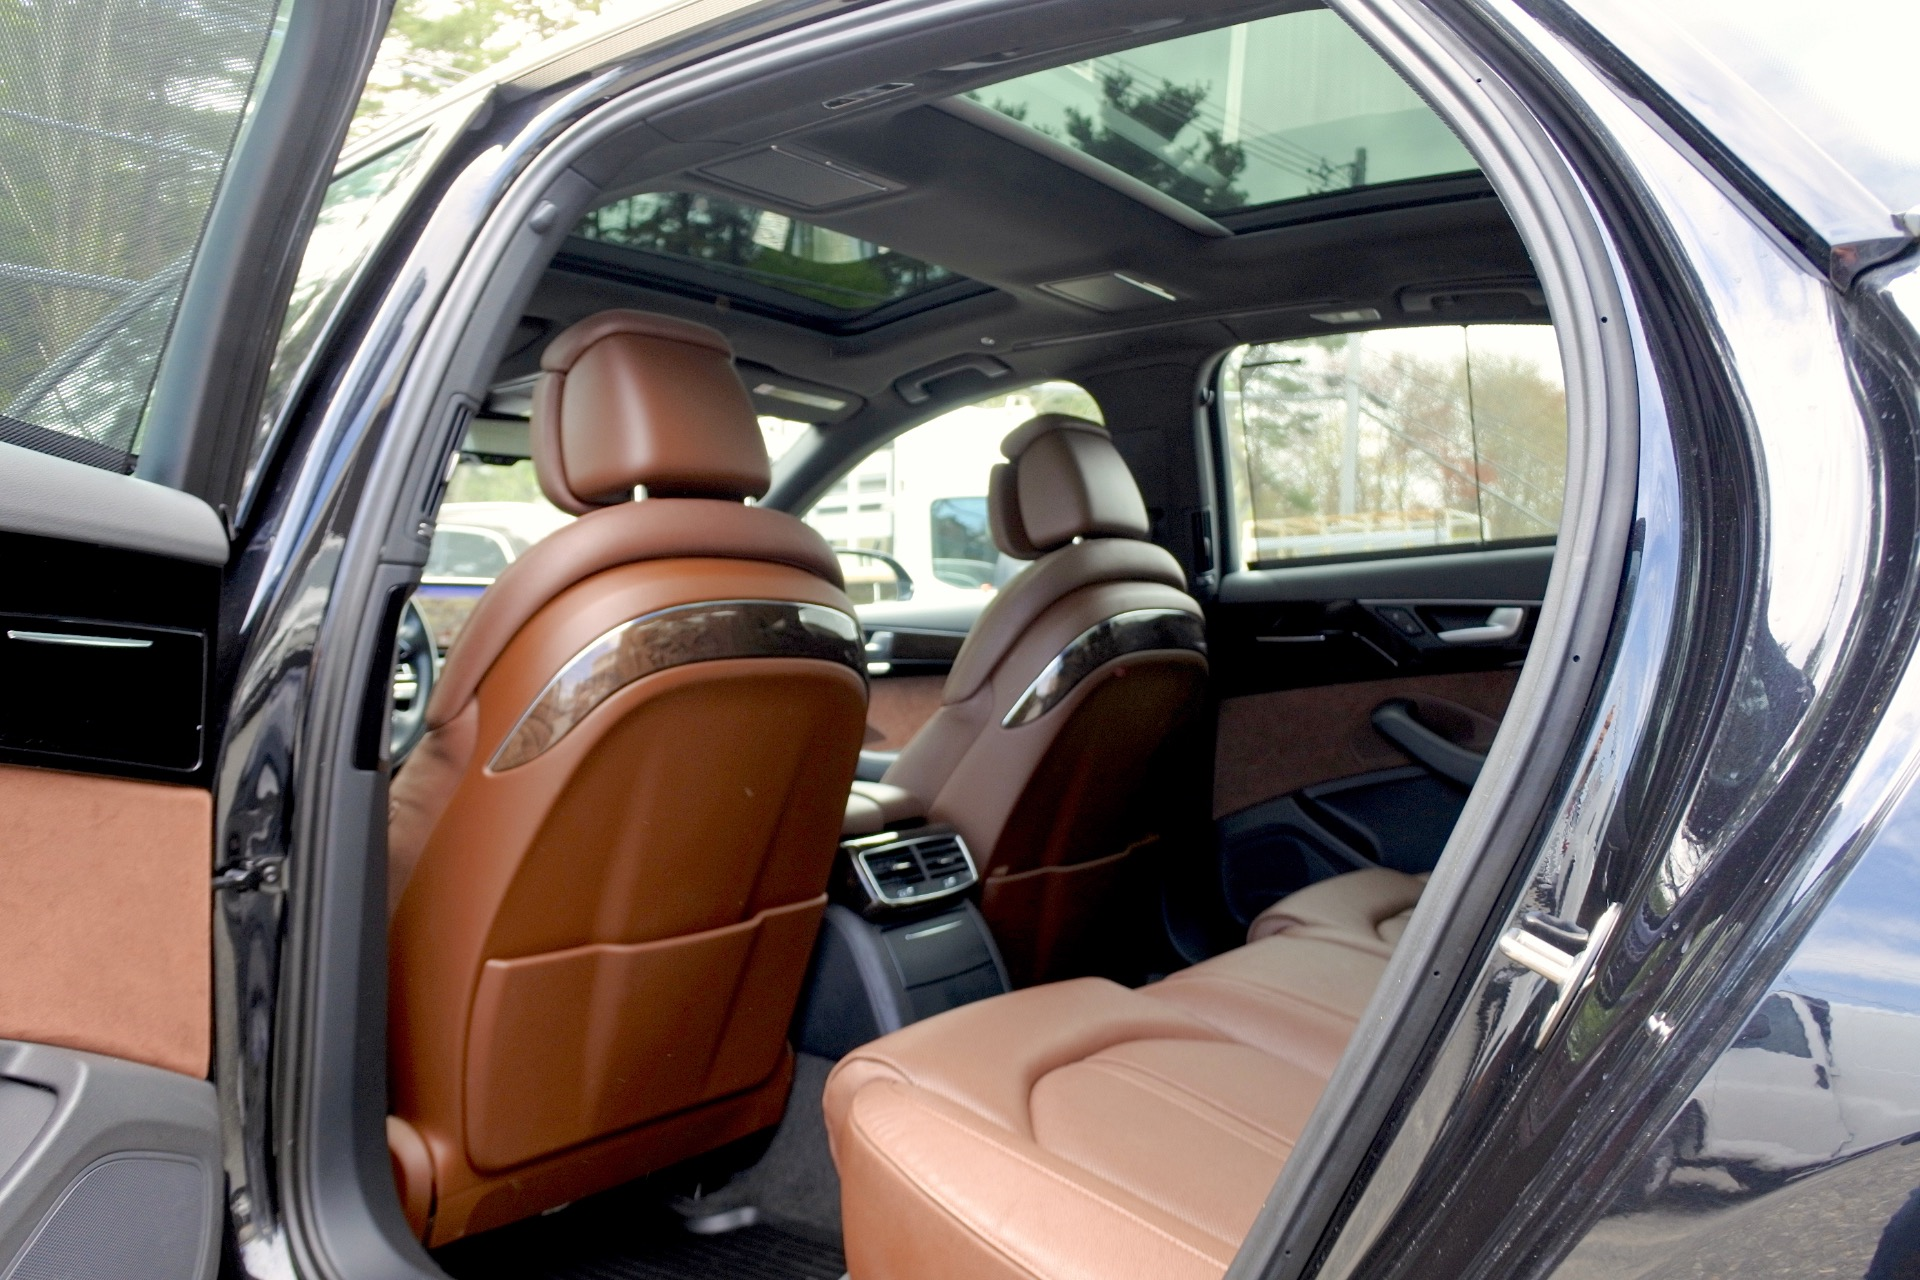 Used 2013 Audi A8 l 4.0L Quattro Used 2013 Audi A8 l 4.0L Quattro for sale  at Metro West Motorcars LLC in Shrewsbury MA 15